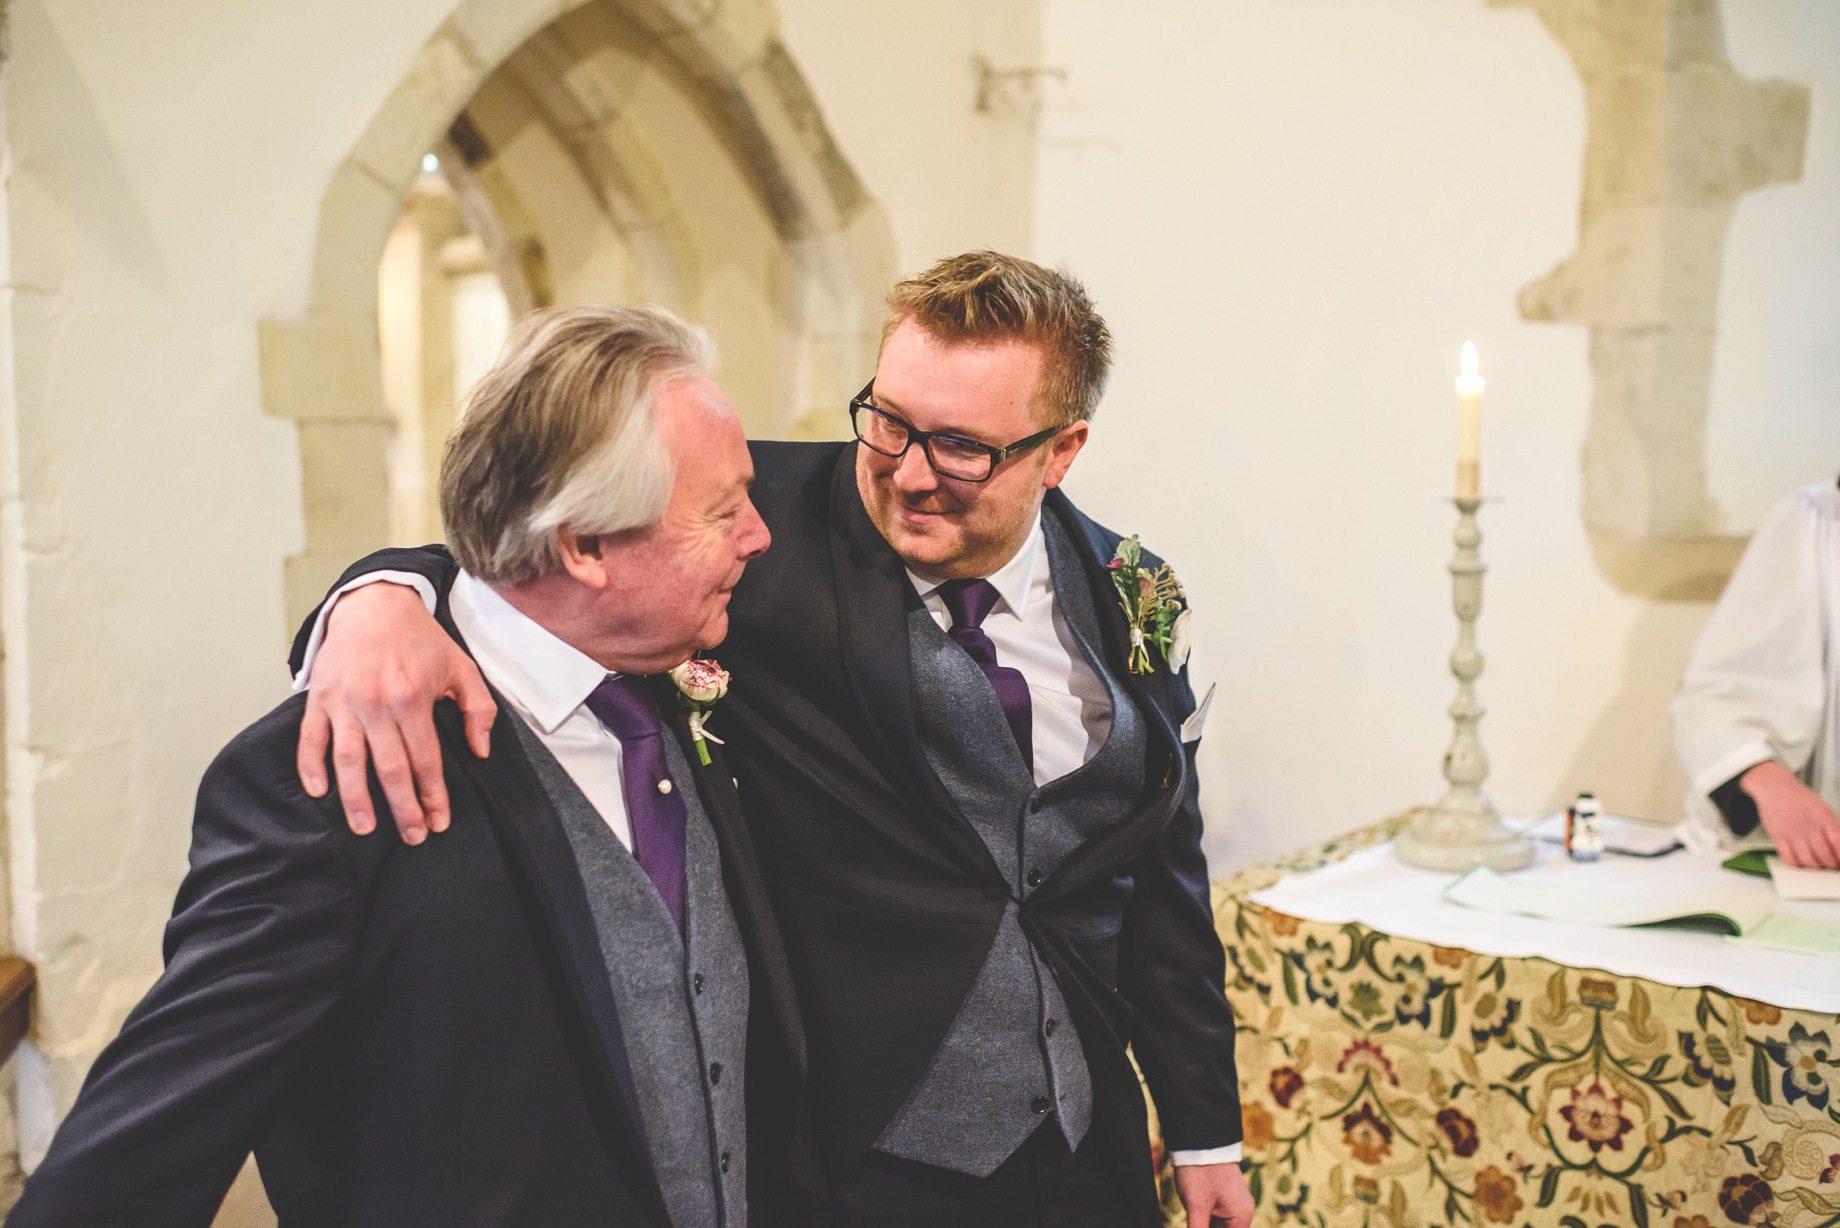 Heather and Chris - Hampshire wedding photography (84 of 174)